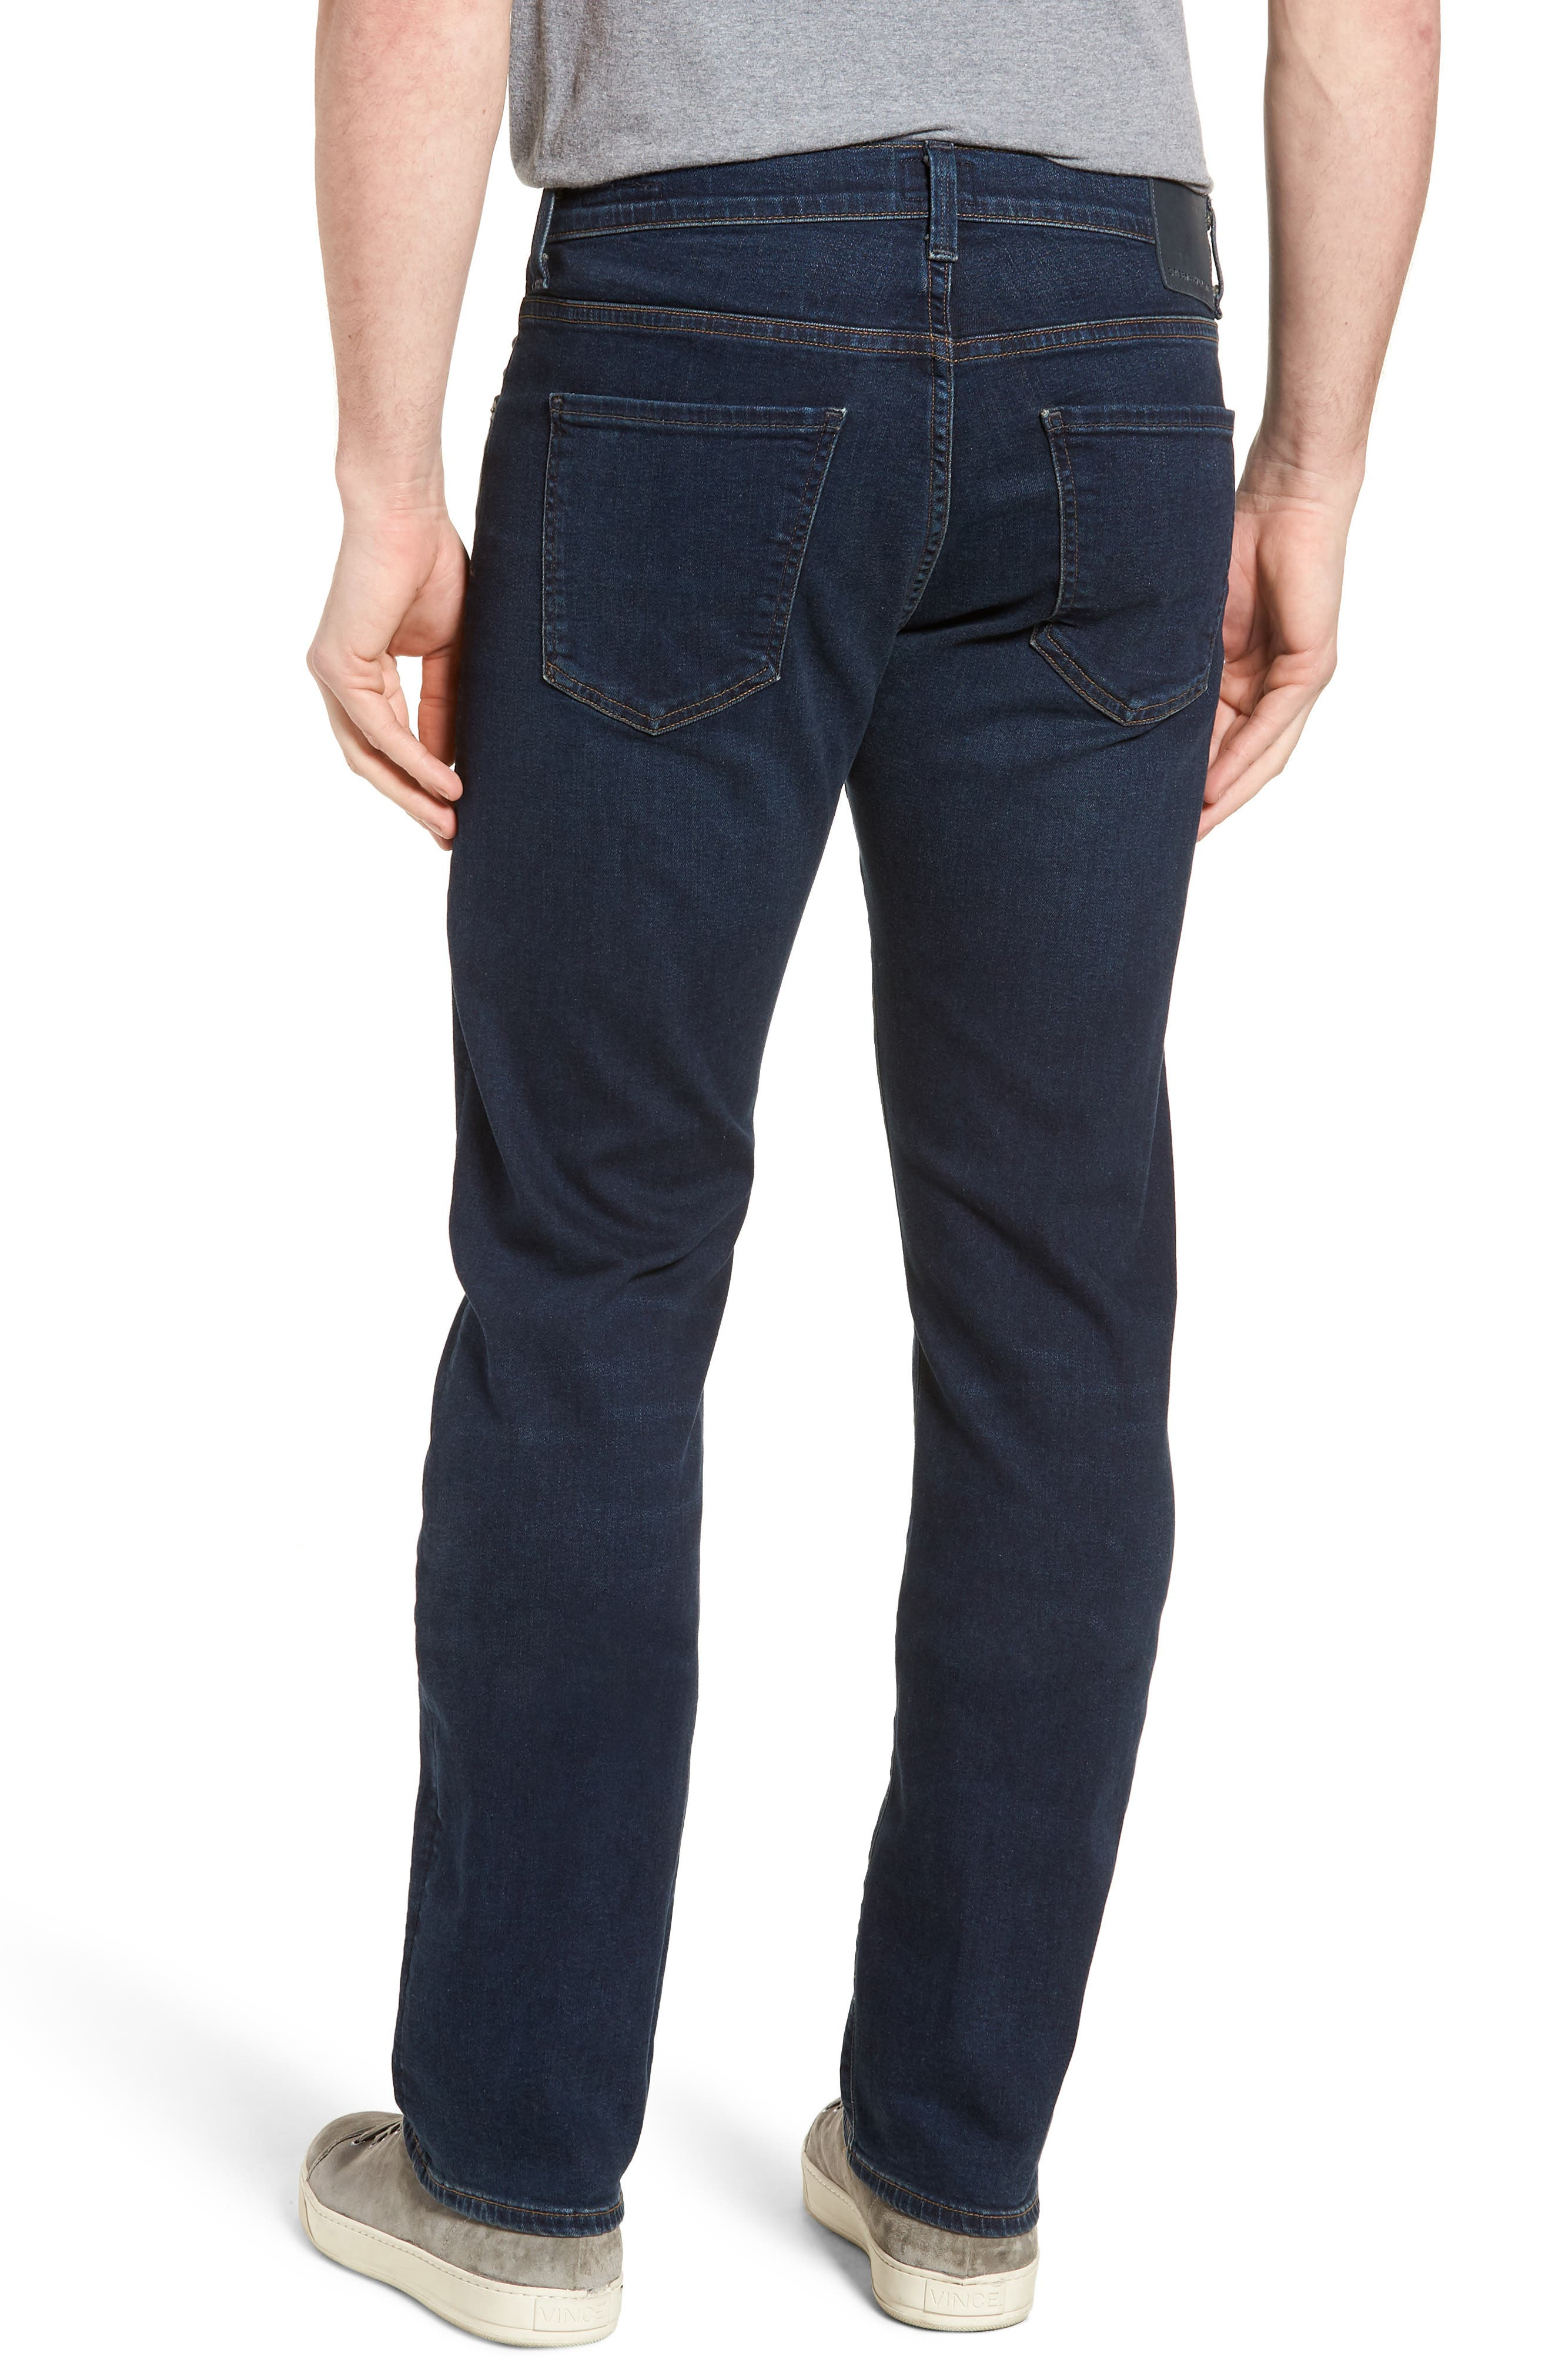 Perform - Sid Straight Leg Jeans,                             Alternate thumbnail 2, color,                             EVERSON